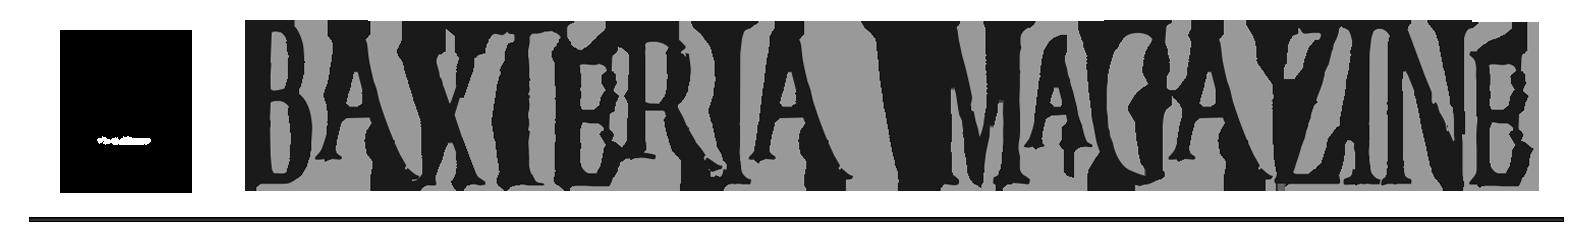 logo_baxteria magazine